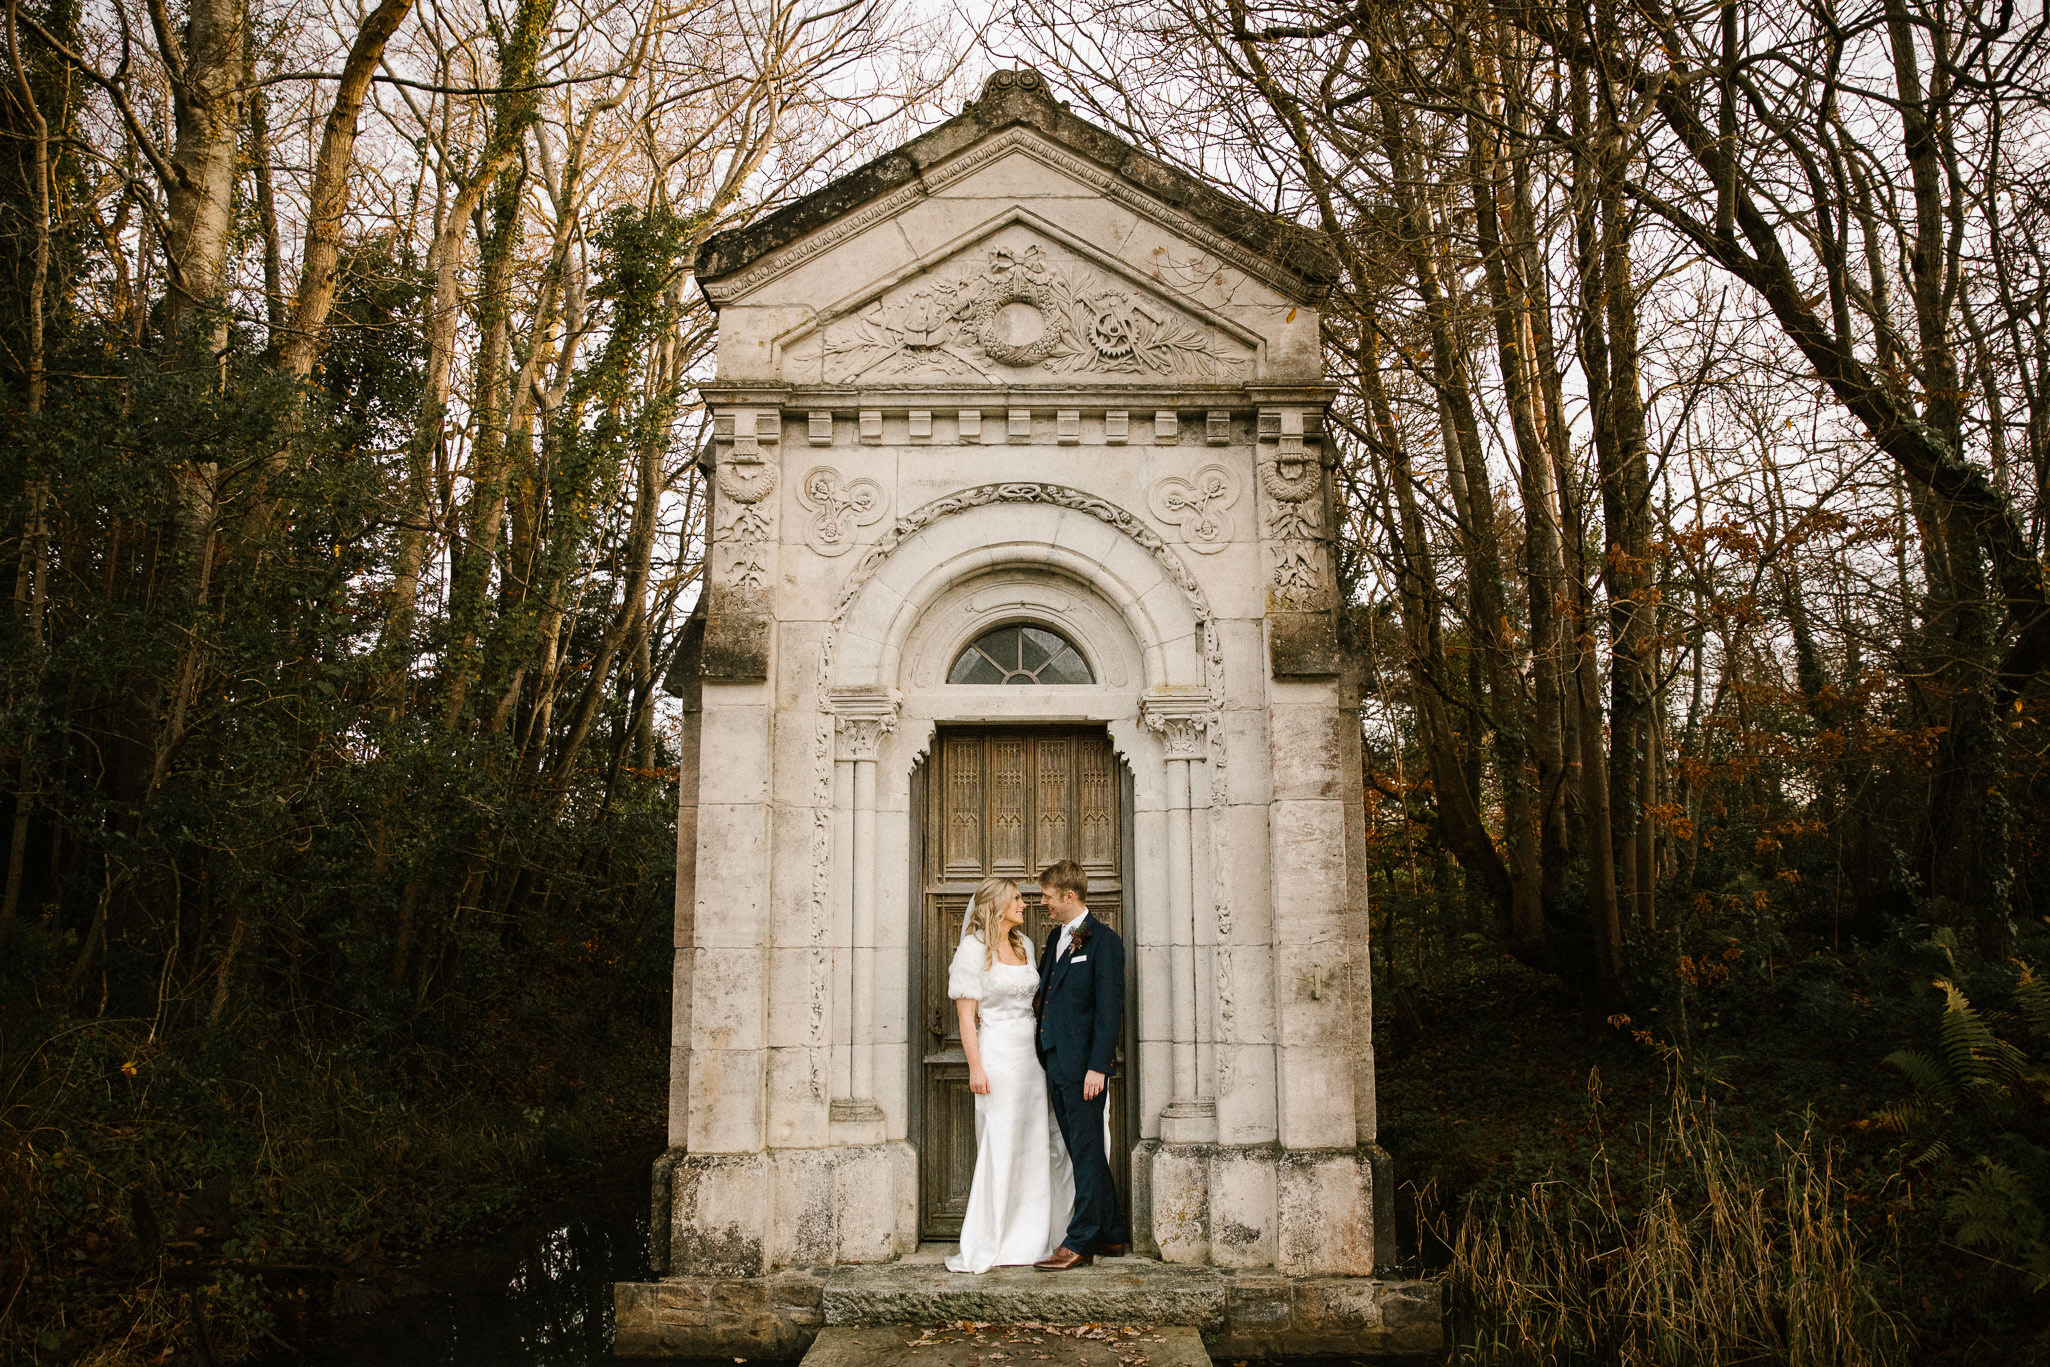 clairebyrnephotography-wedding-cliff-lyons-sparklers-christmas-clara-john-11.jpg